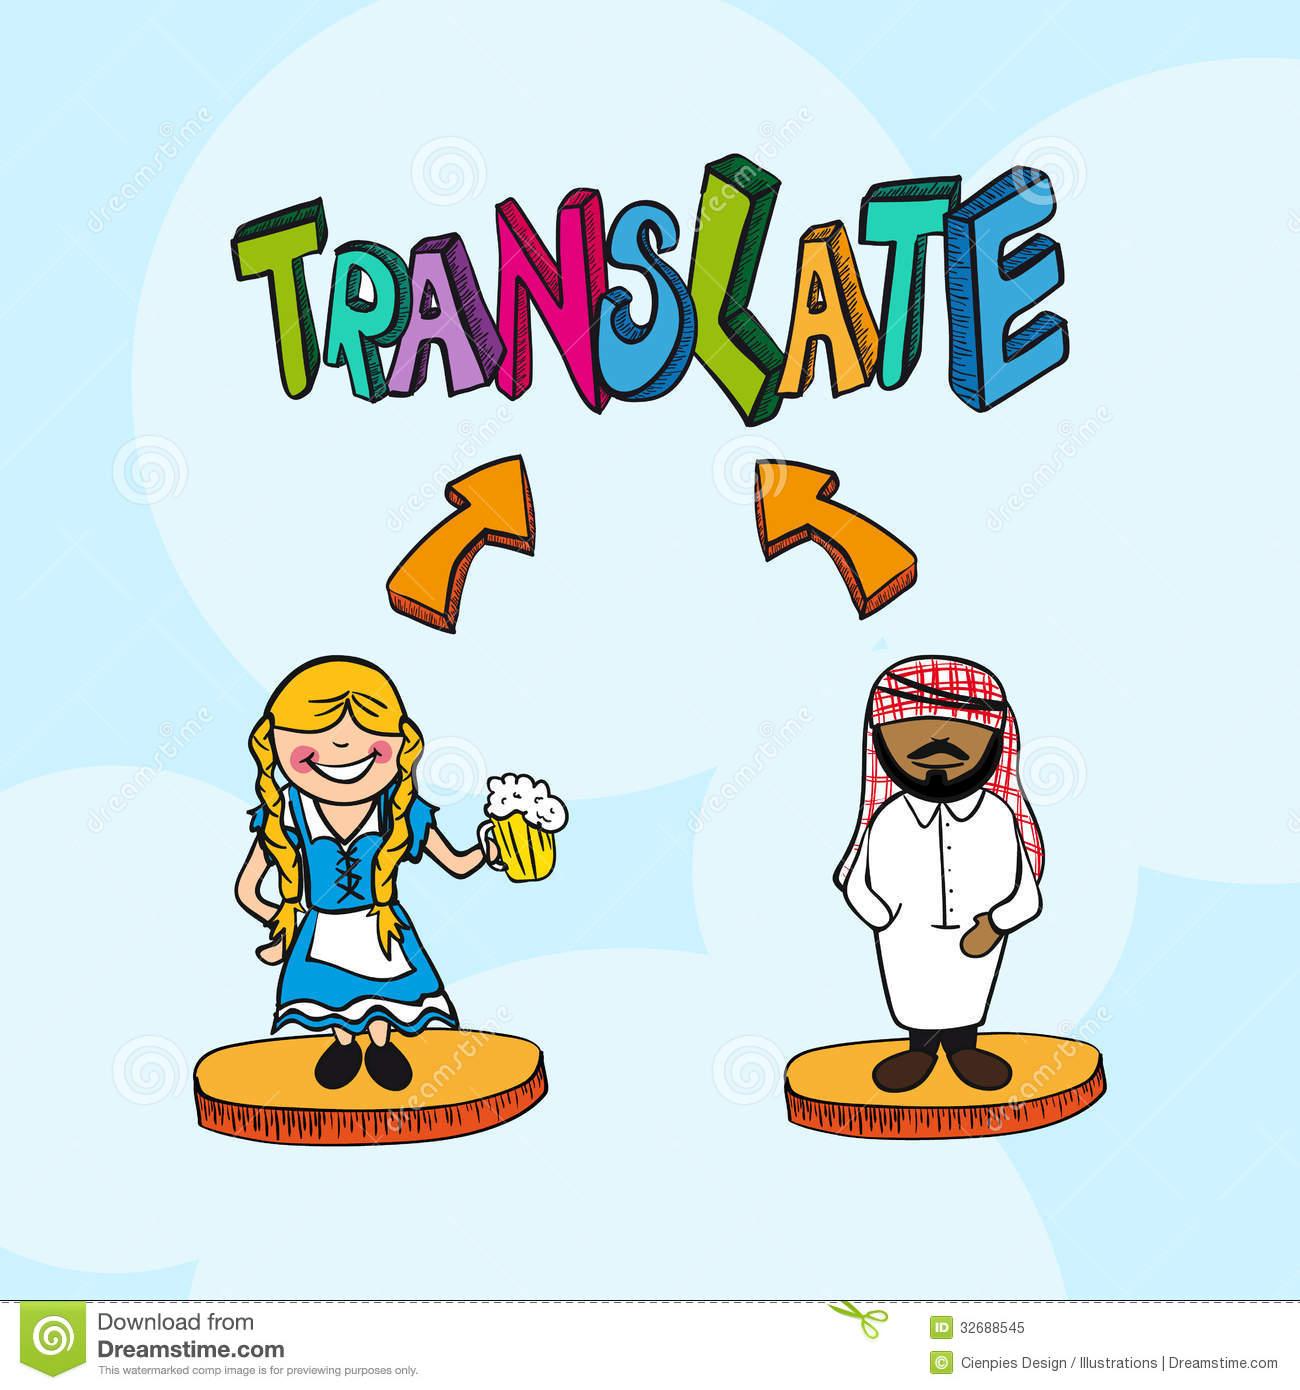 Translator Clipart.